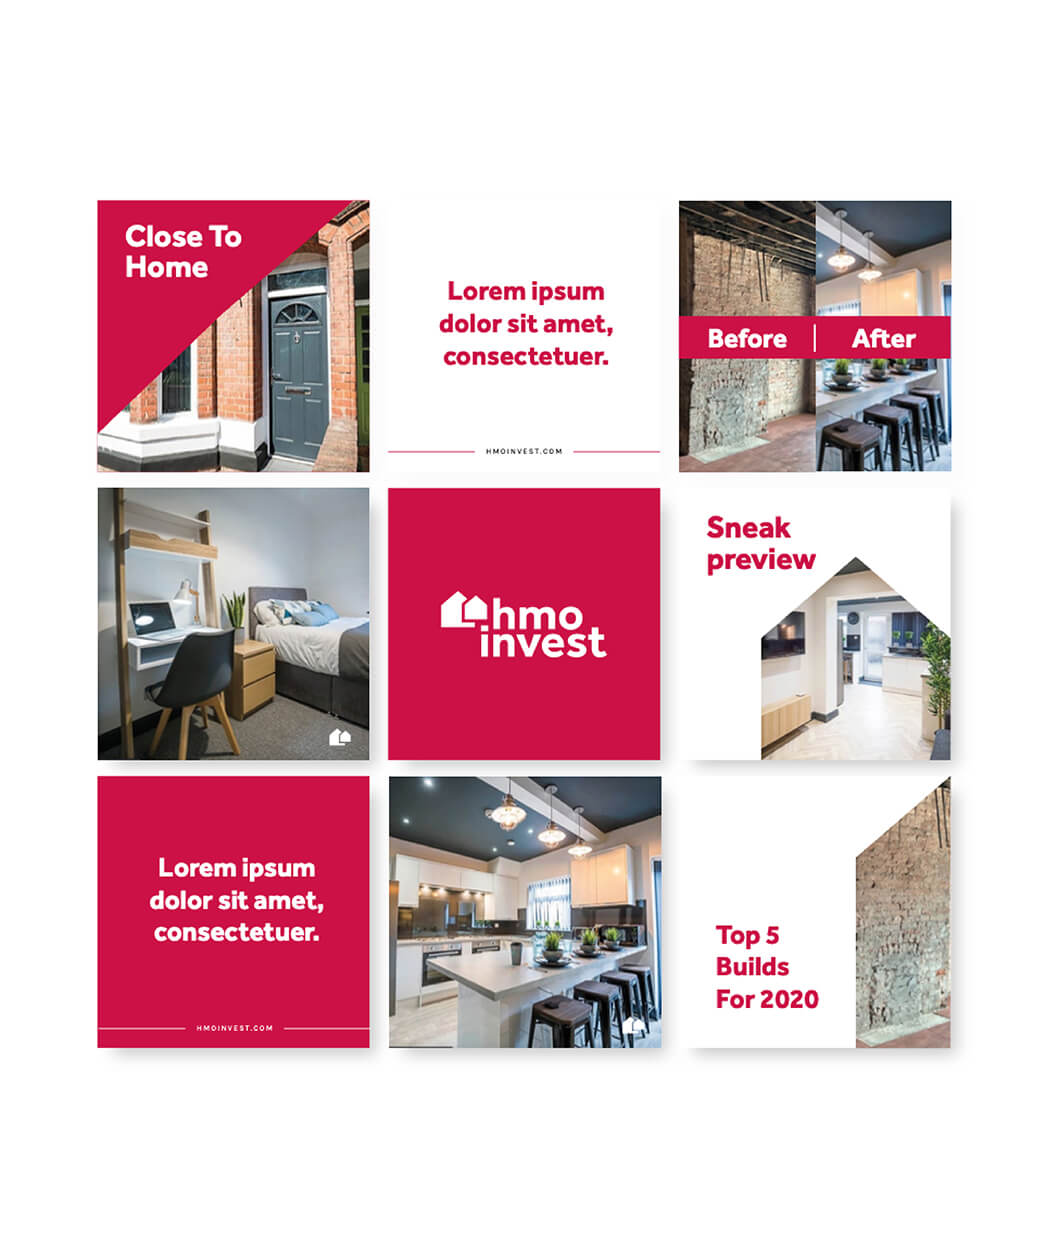 HMO Invest property developer social media instagram design